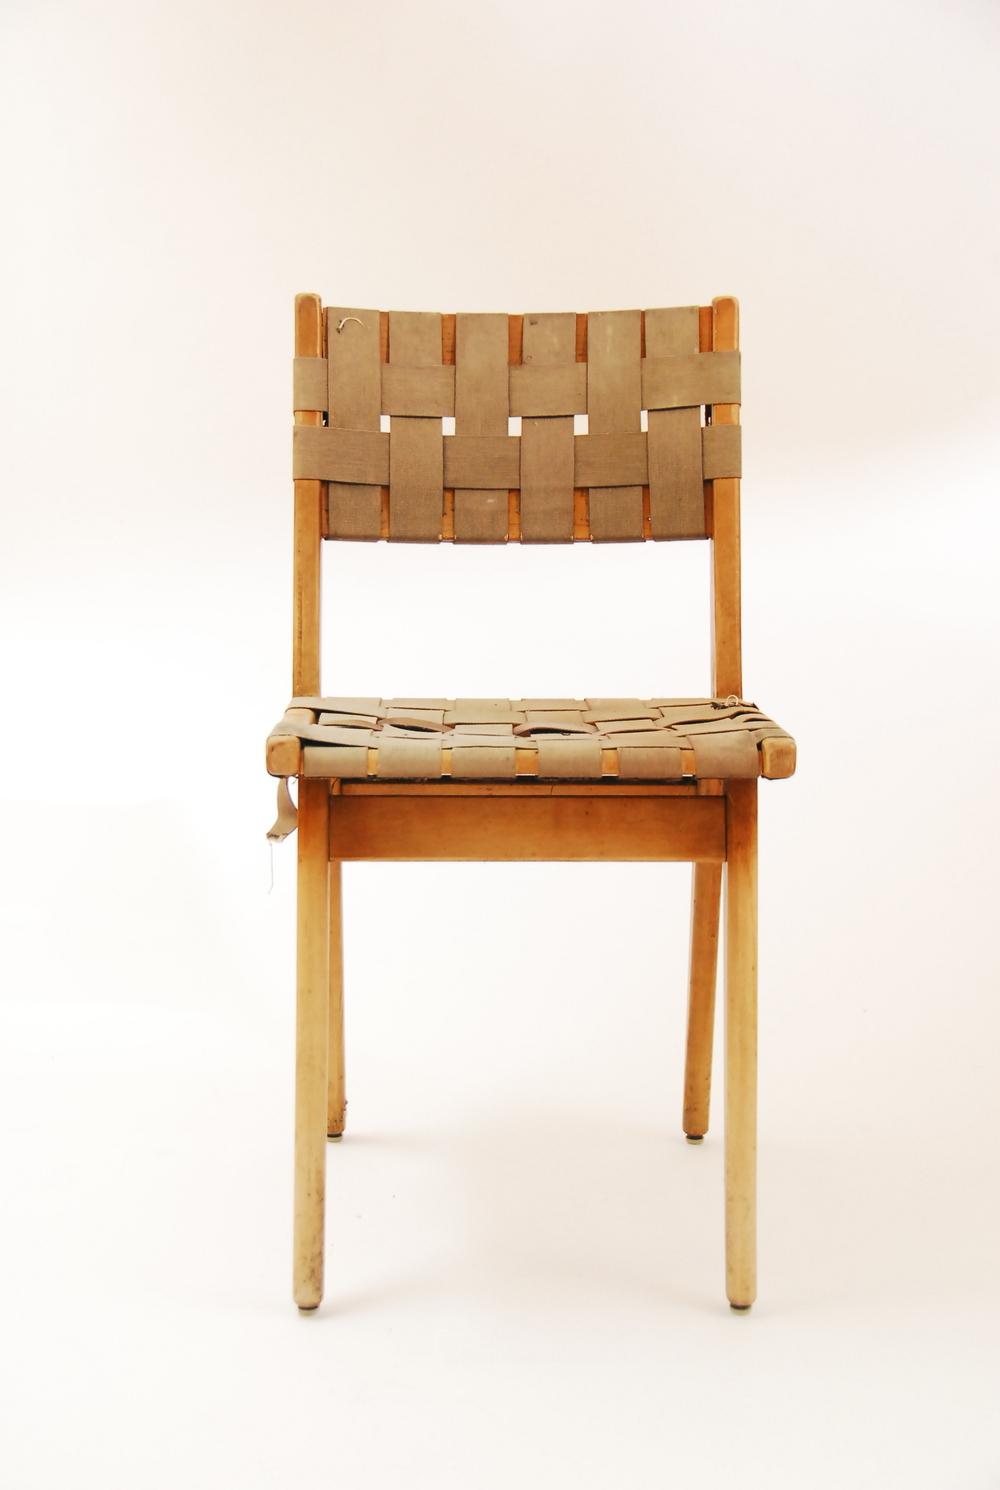 studio_nicco_chair_1338.JPG